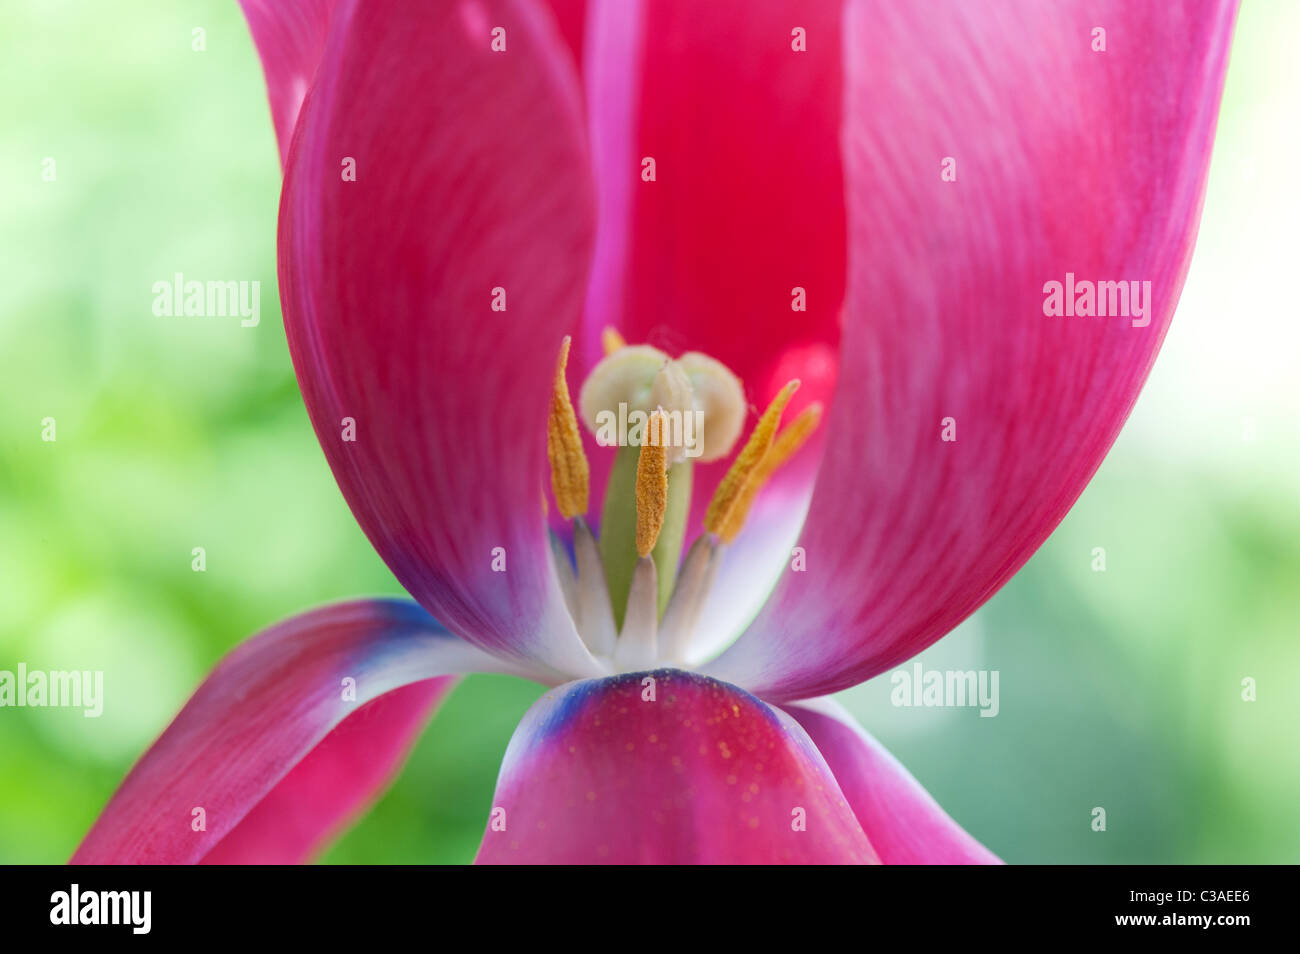 Tulipa. Pink Tulip showing pistil, stigma and stamens Stock Photo